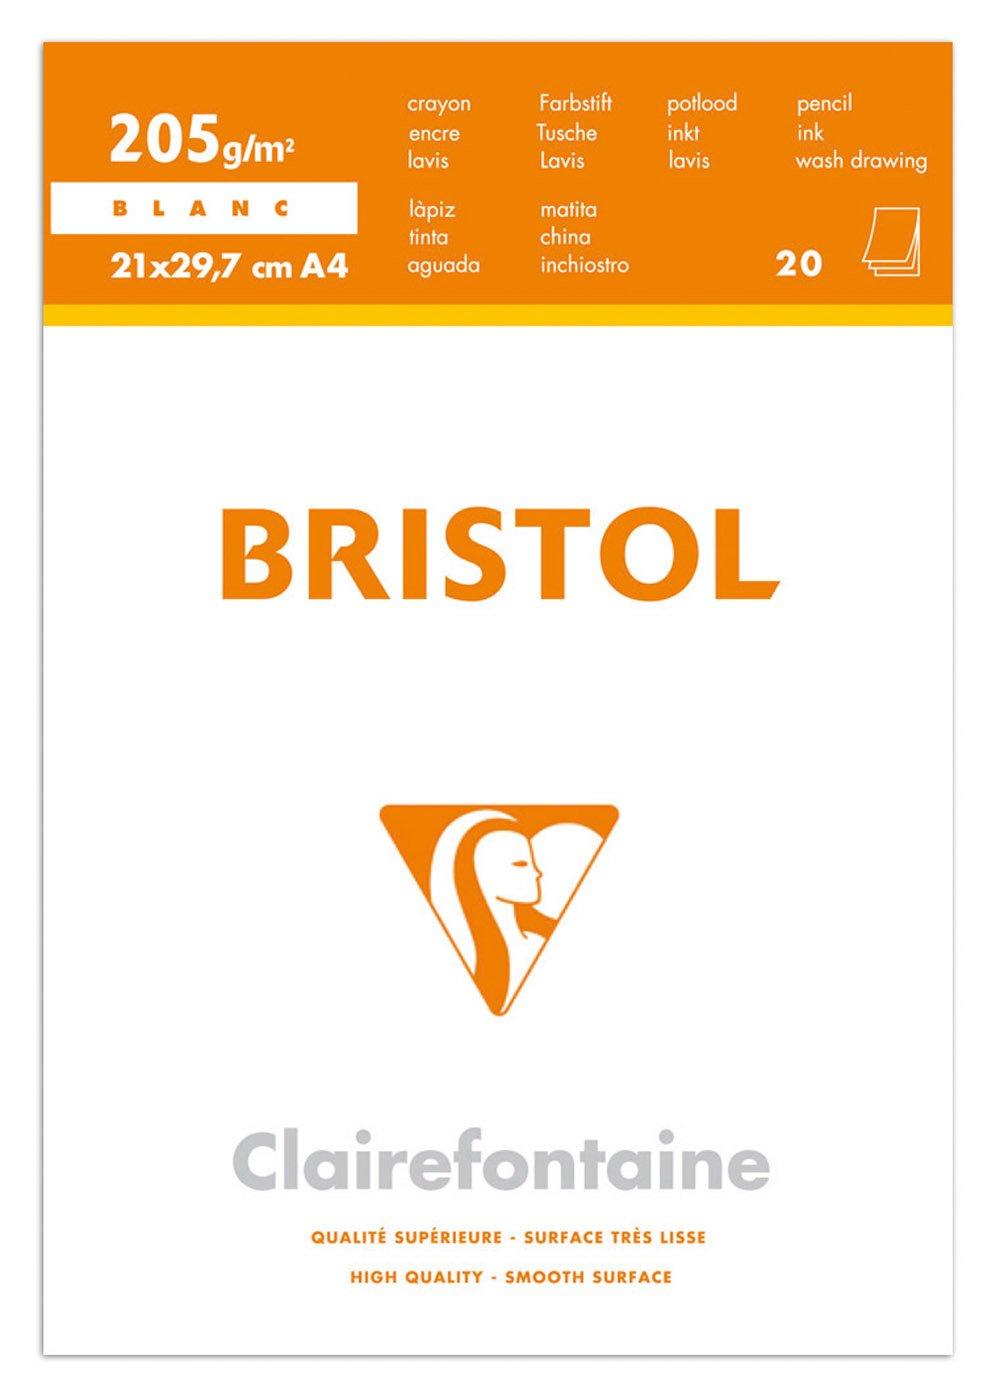 Clairefontaine 96370C Confezione Carta Bristol Extra, 33.9 x 25.3 x 0.4 cm, Bianco